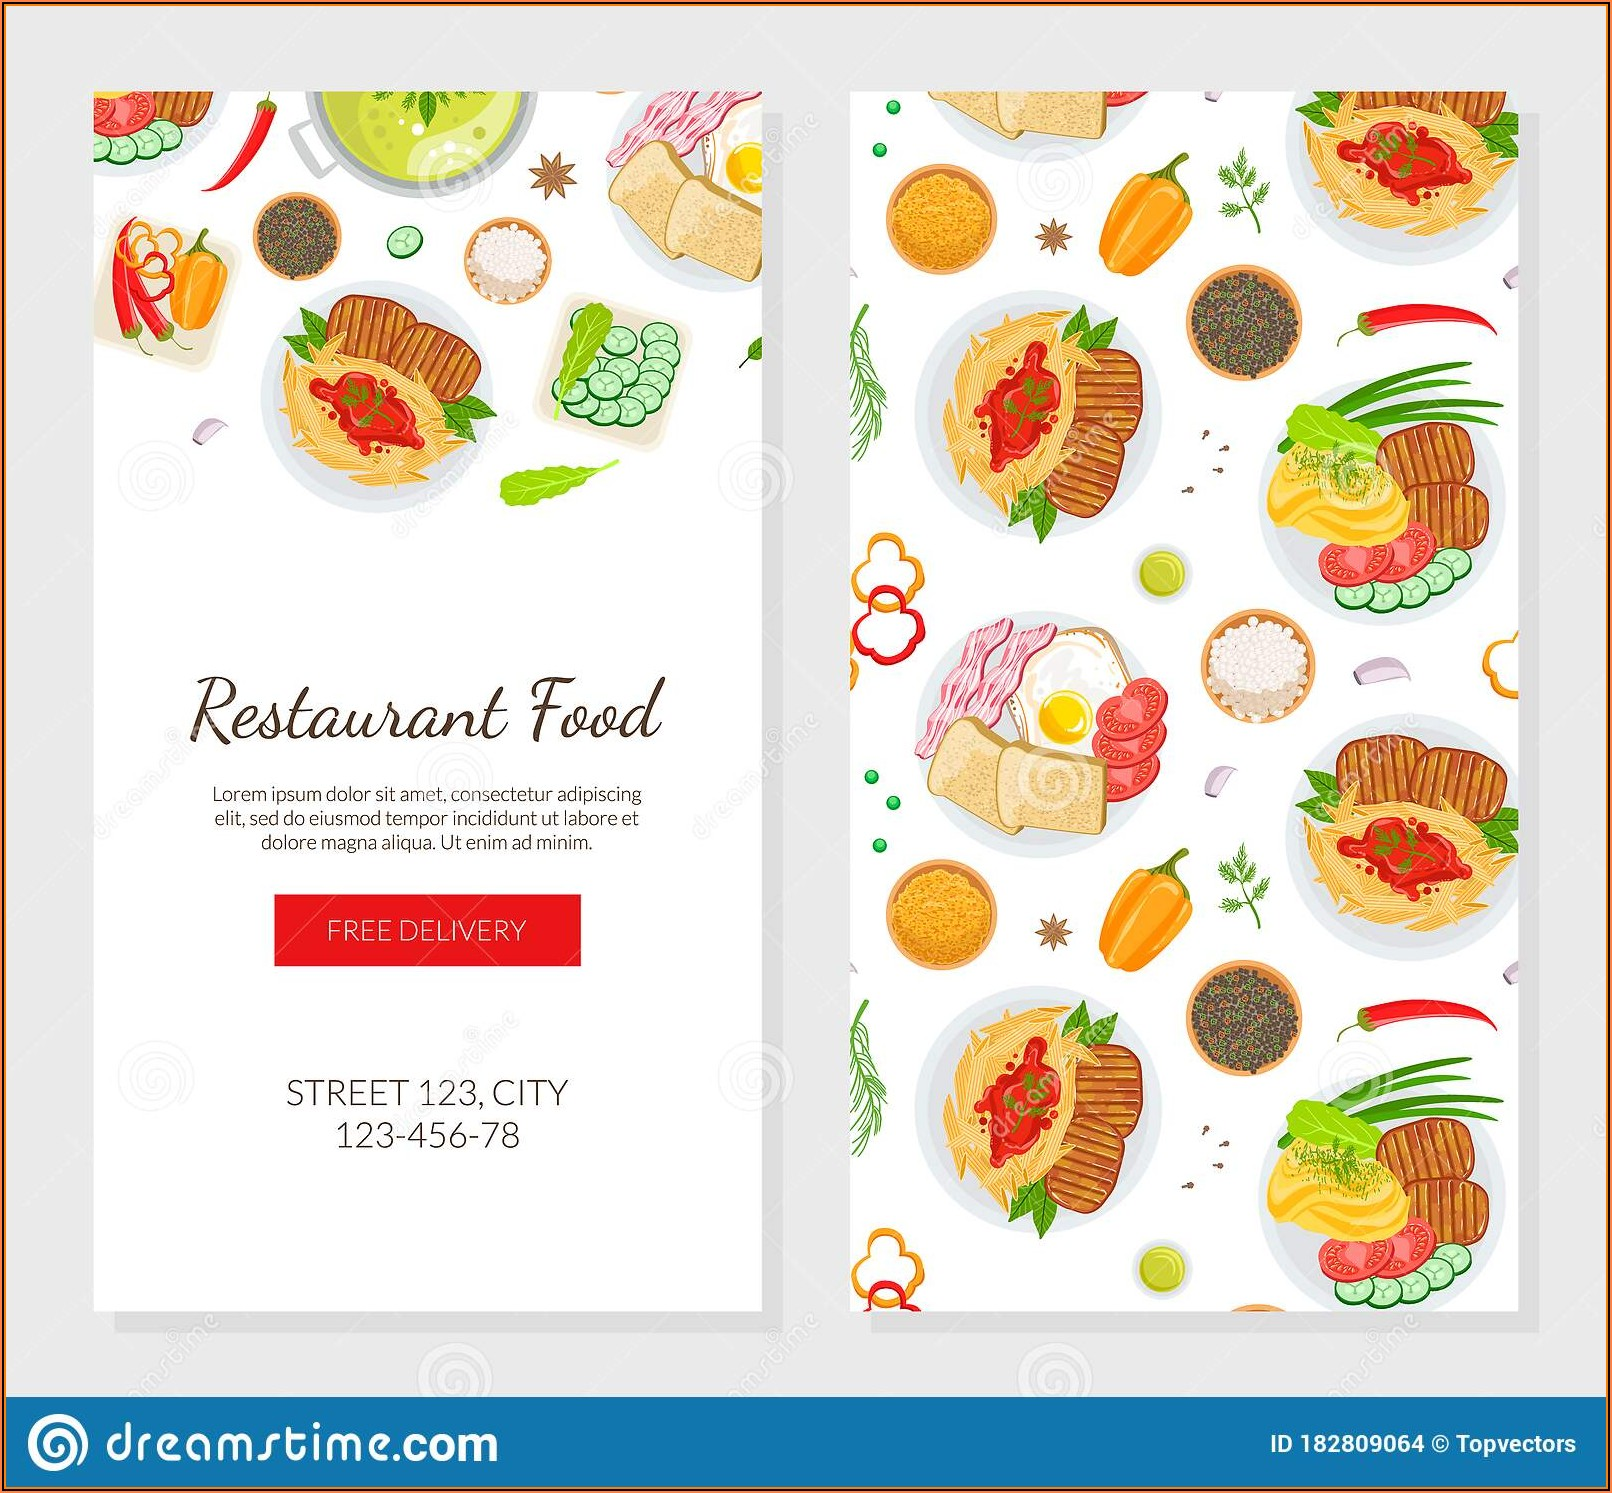 Restaurant Ordering App Template